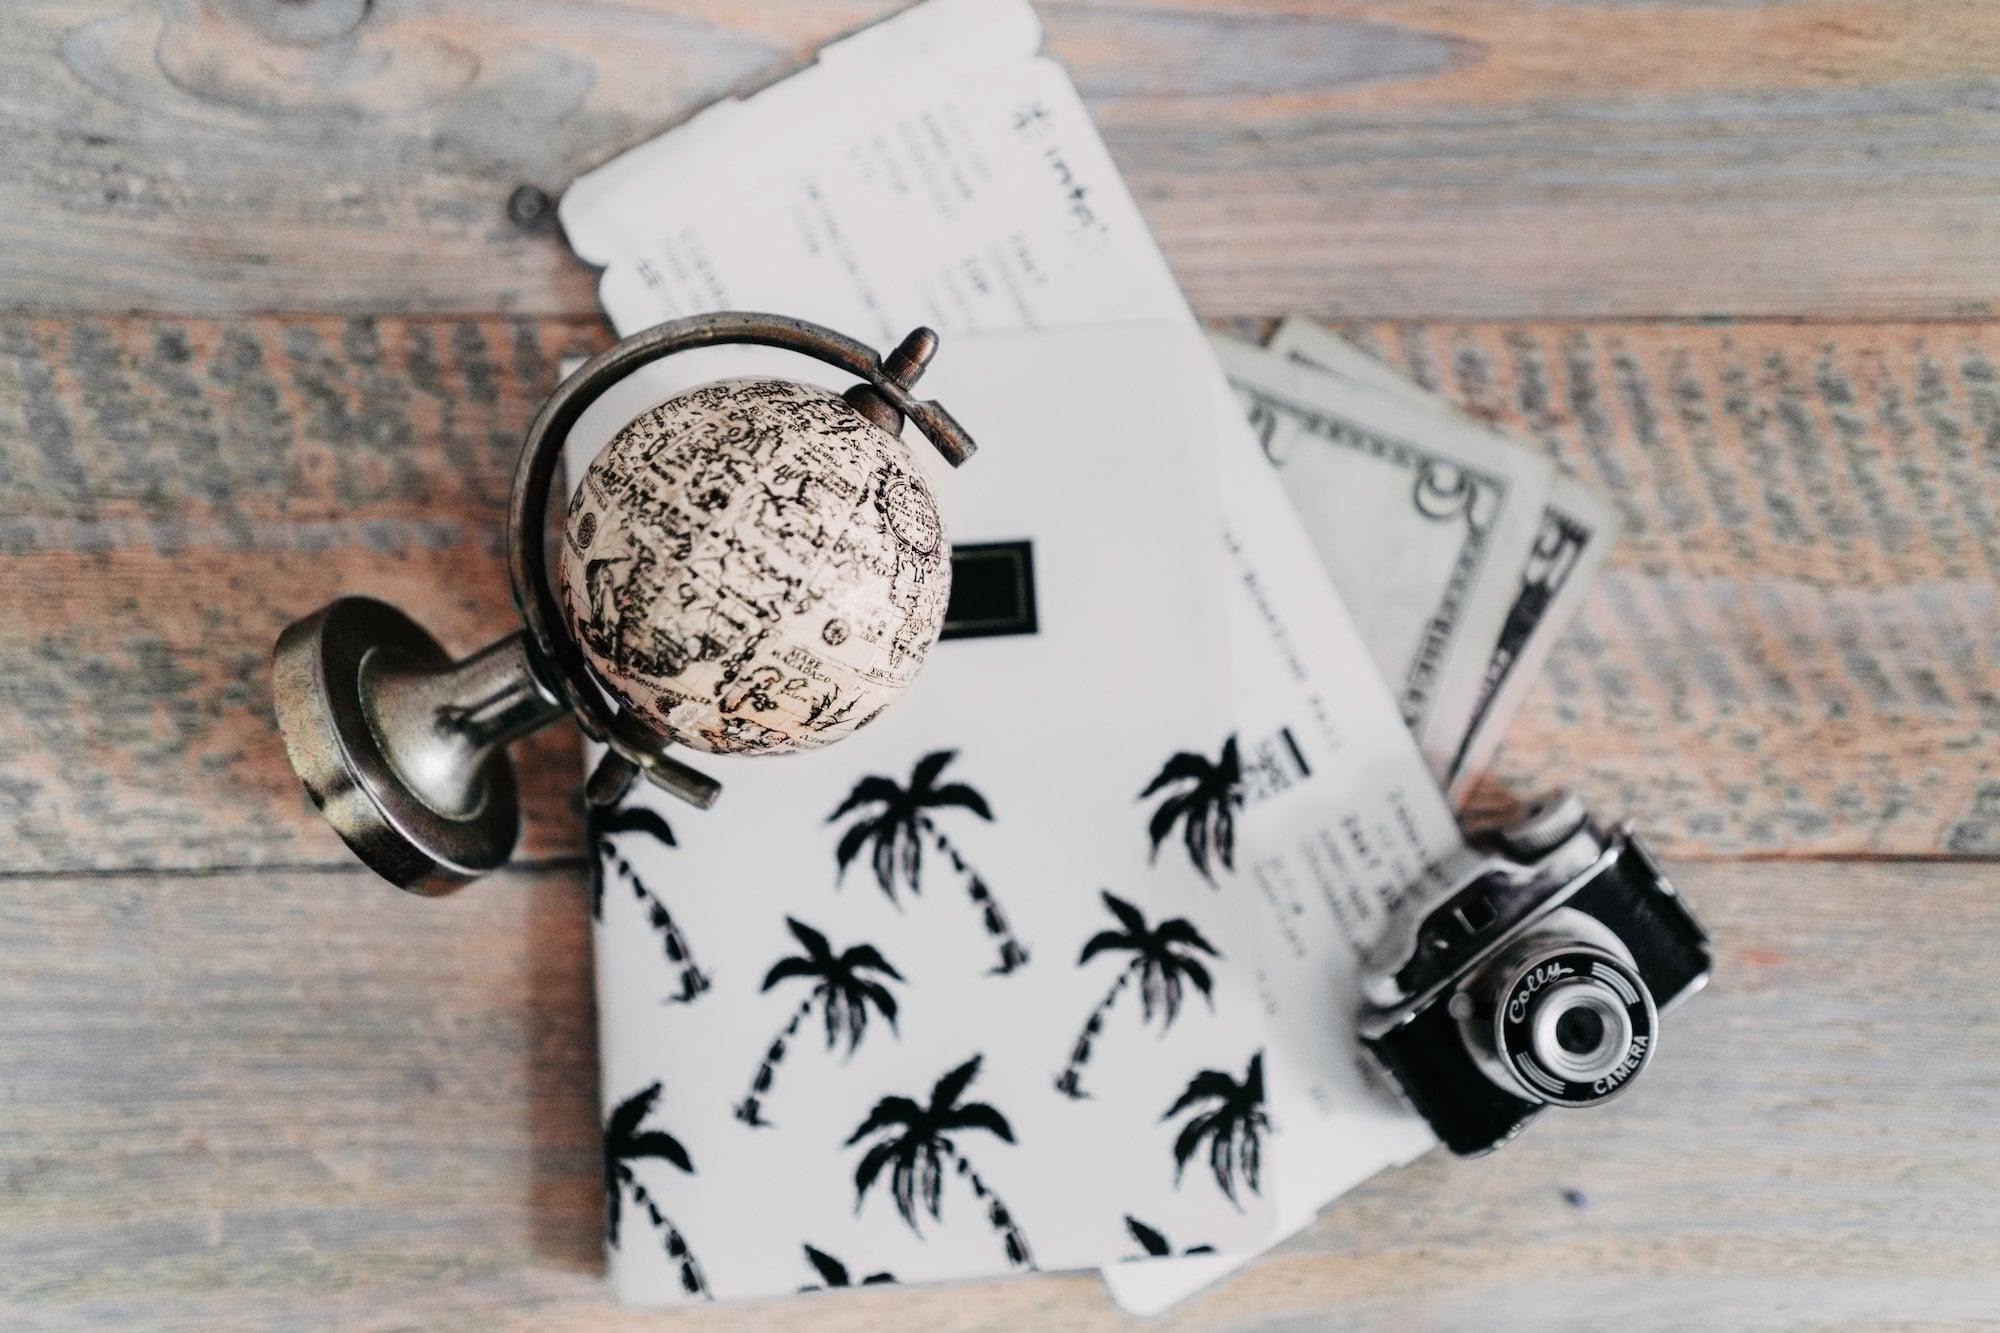 Best Travel Hacks & Tips to Travel for Less